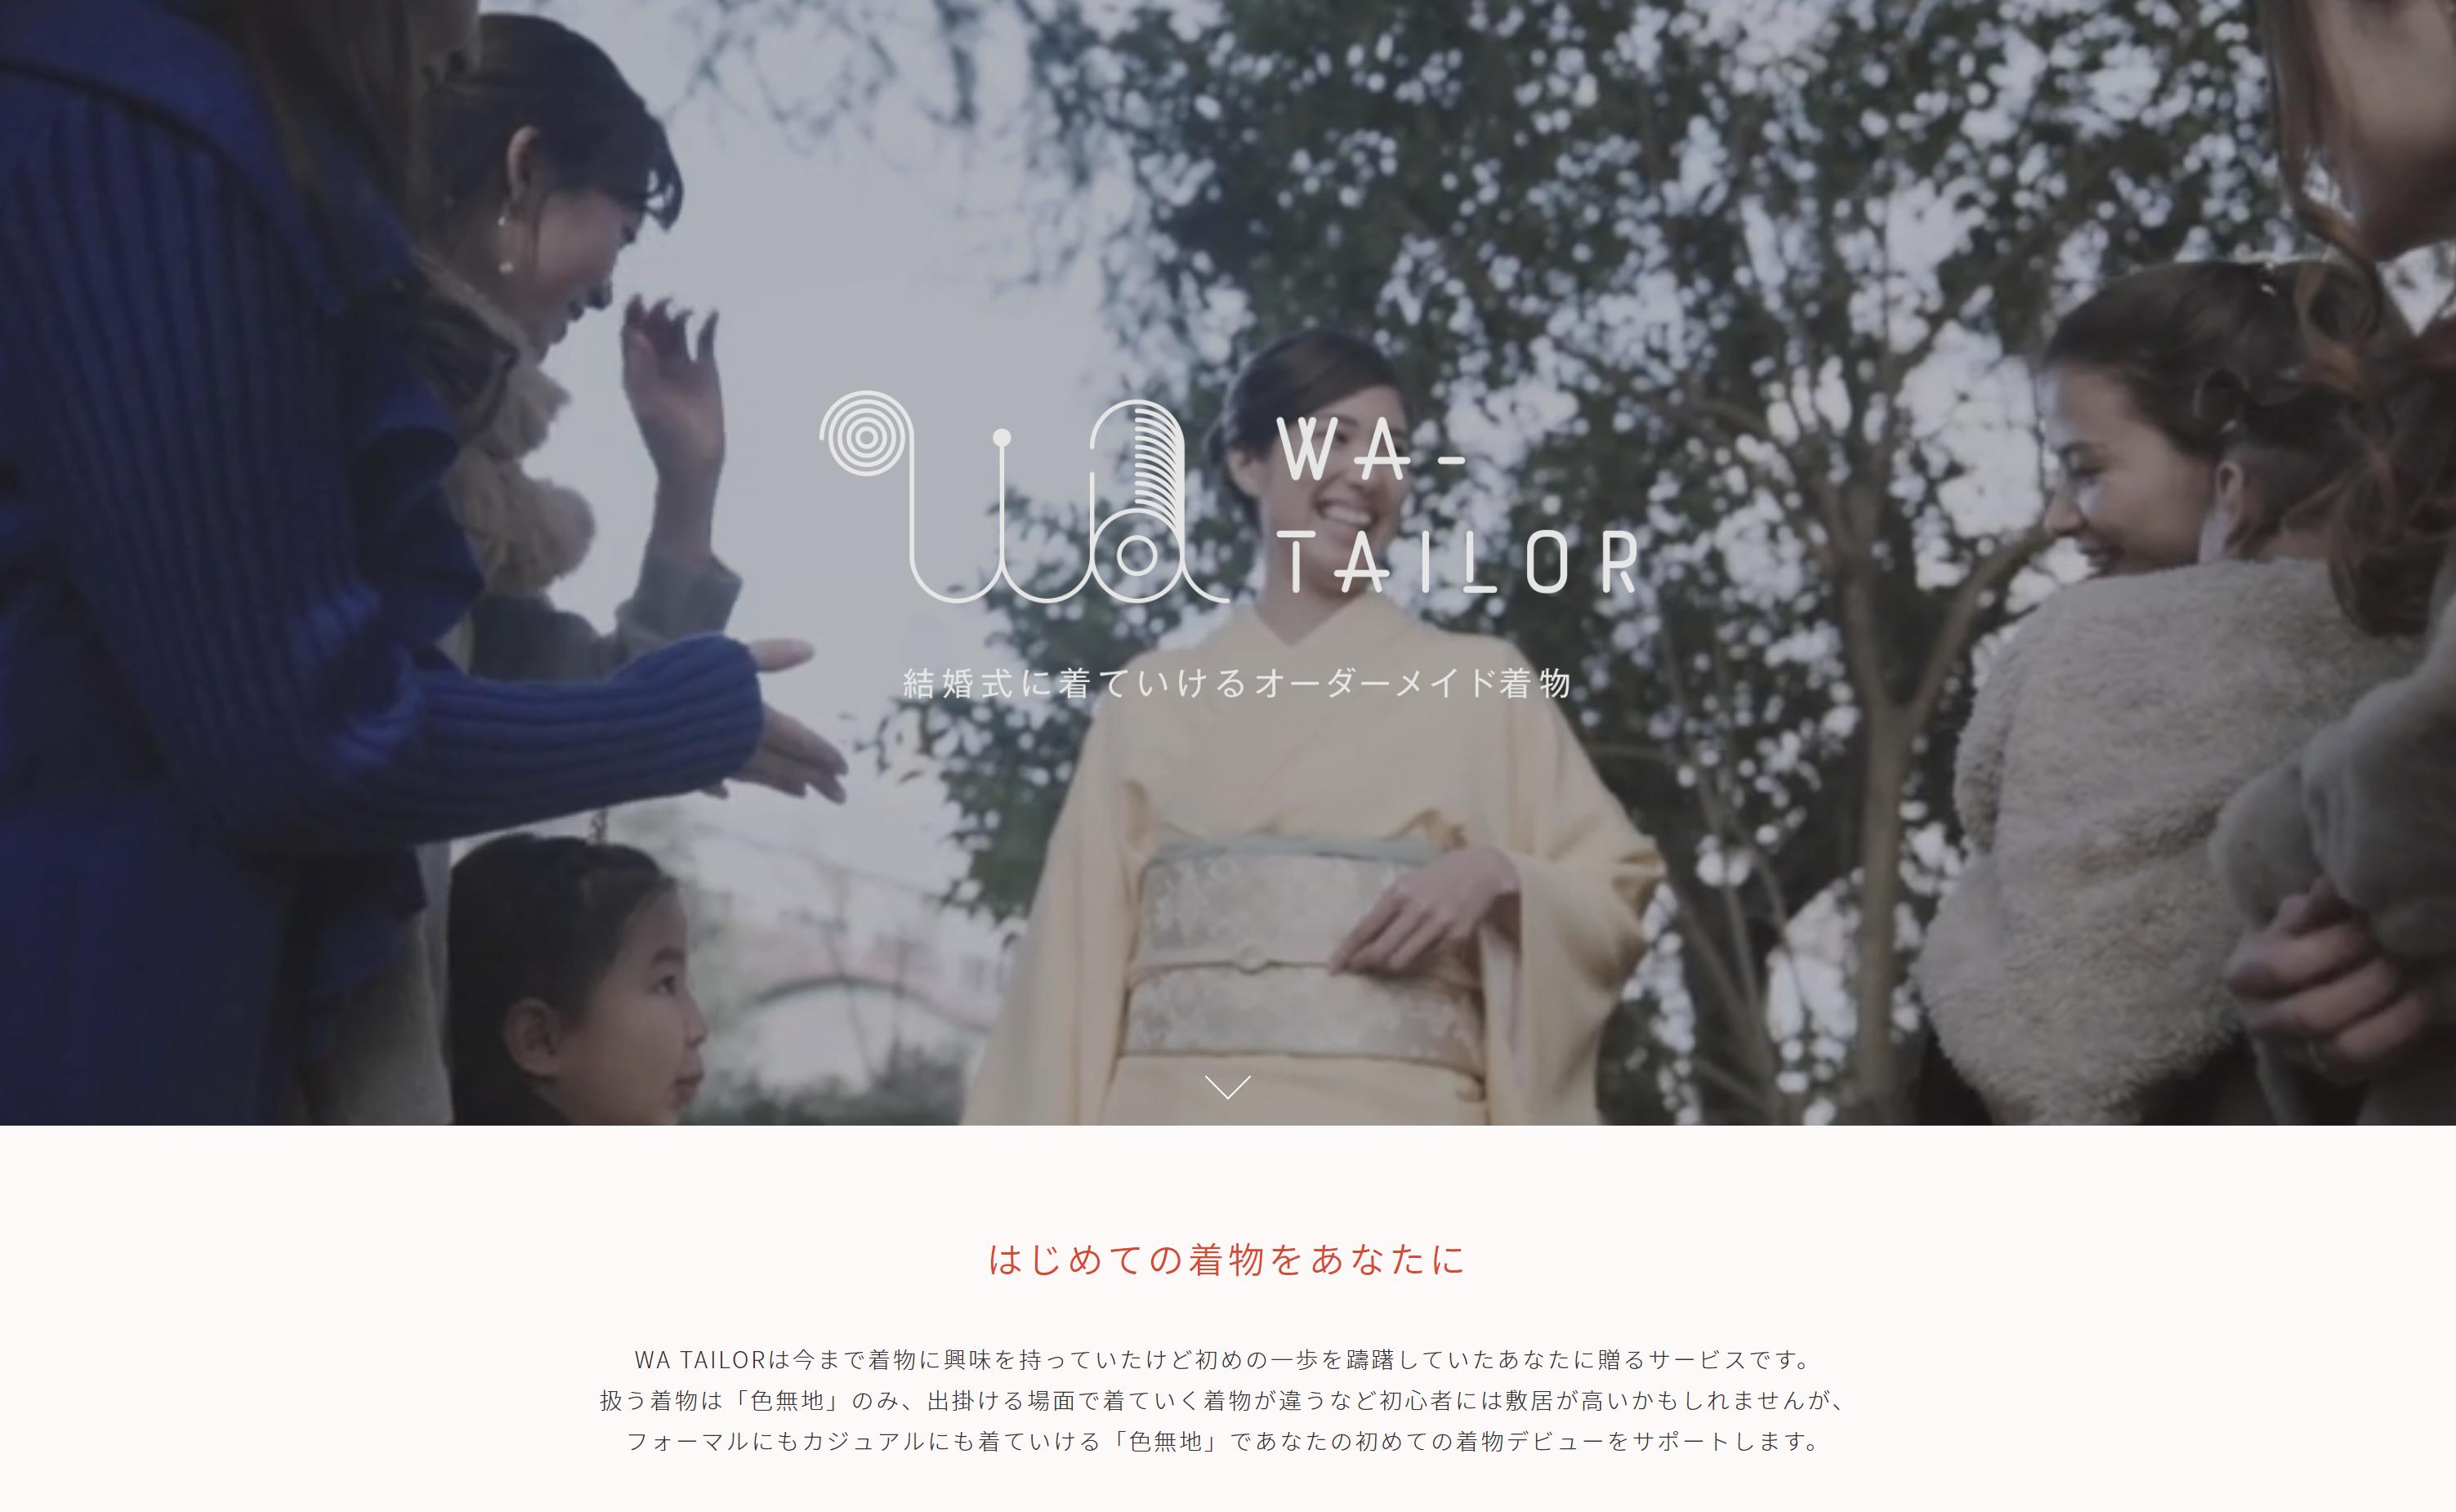 【WEB制作事例】スマホで着物をカスタムオーダー『WA TAILOR』